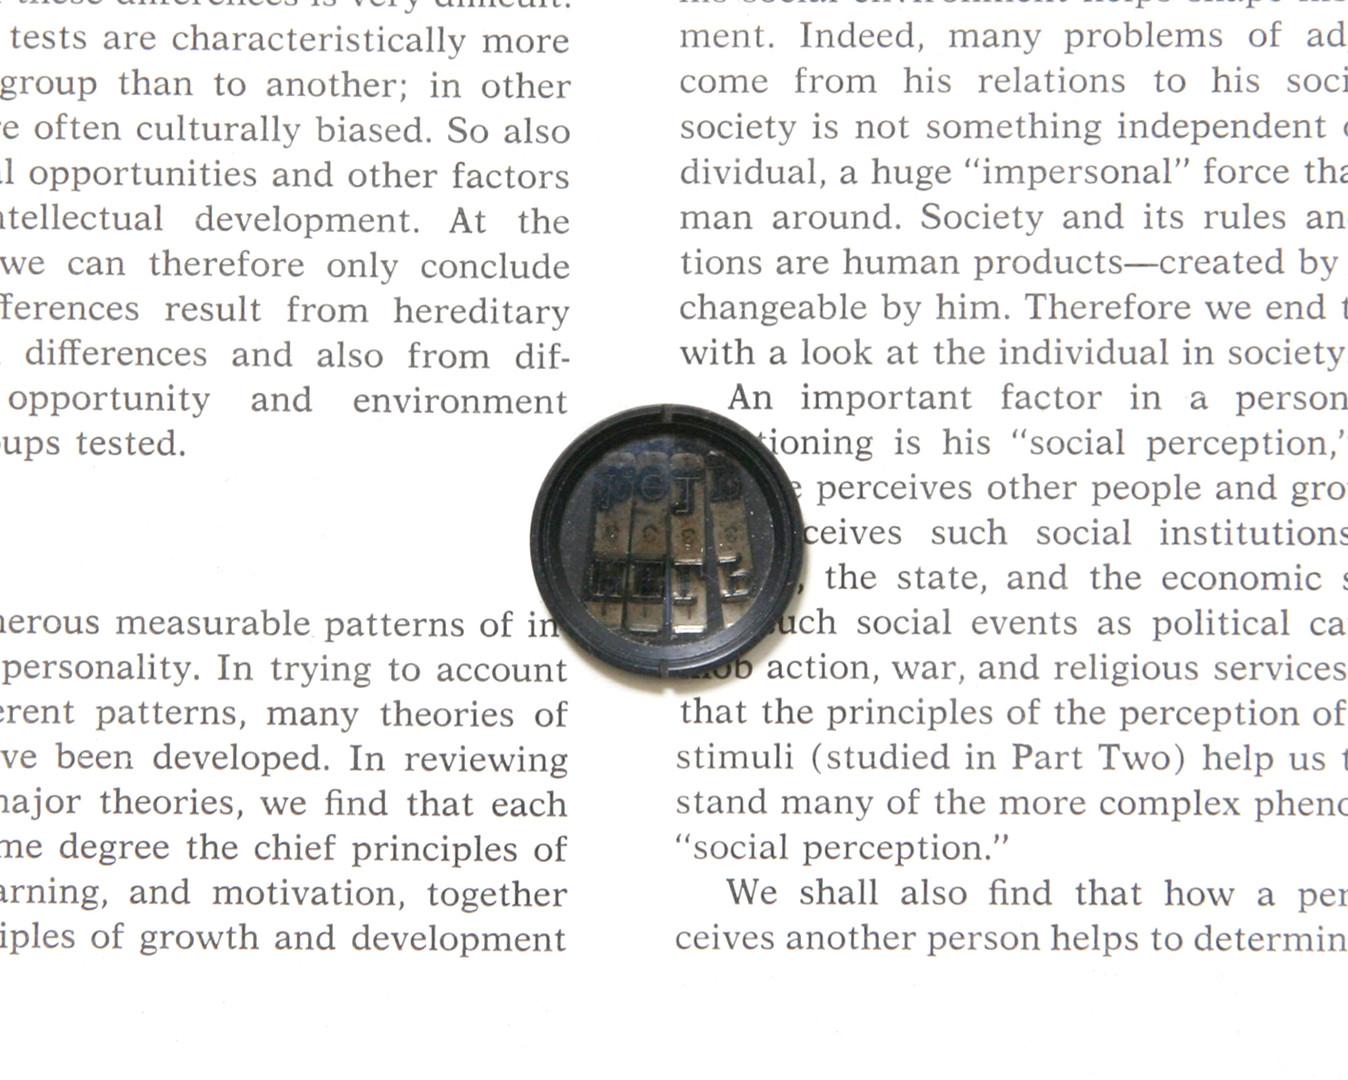 Individual in Society 5.jpg